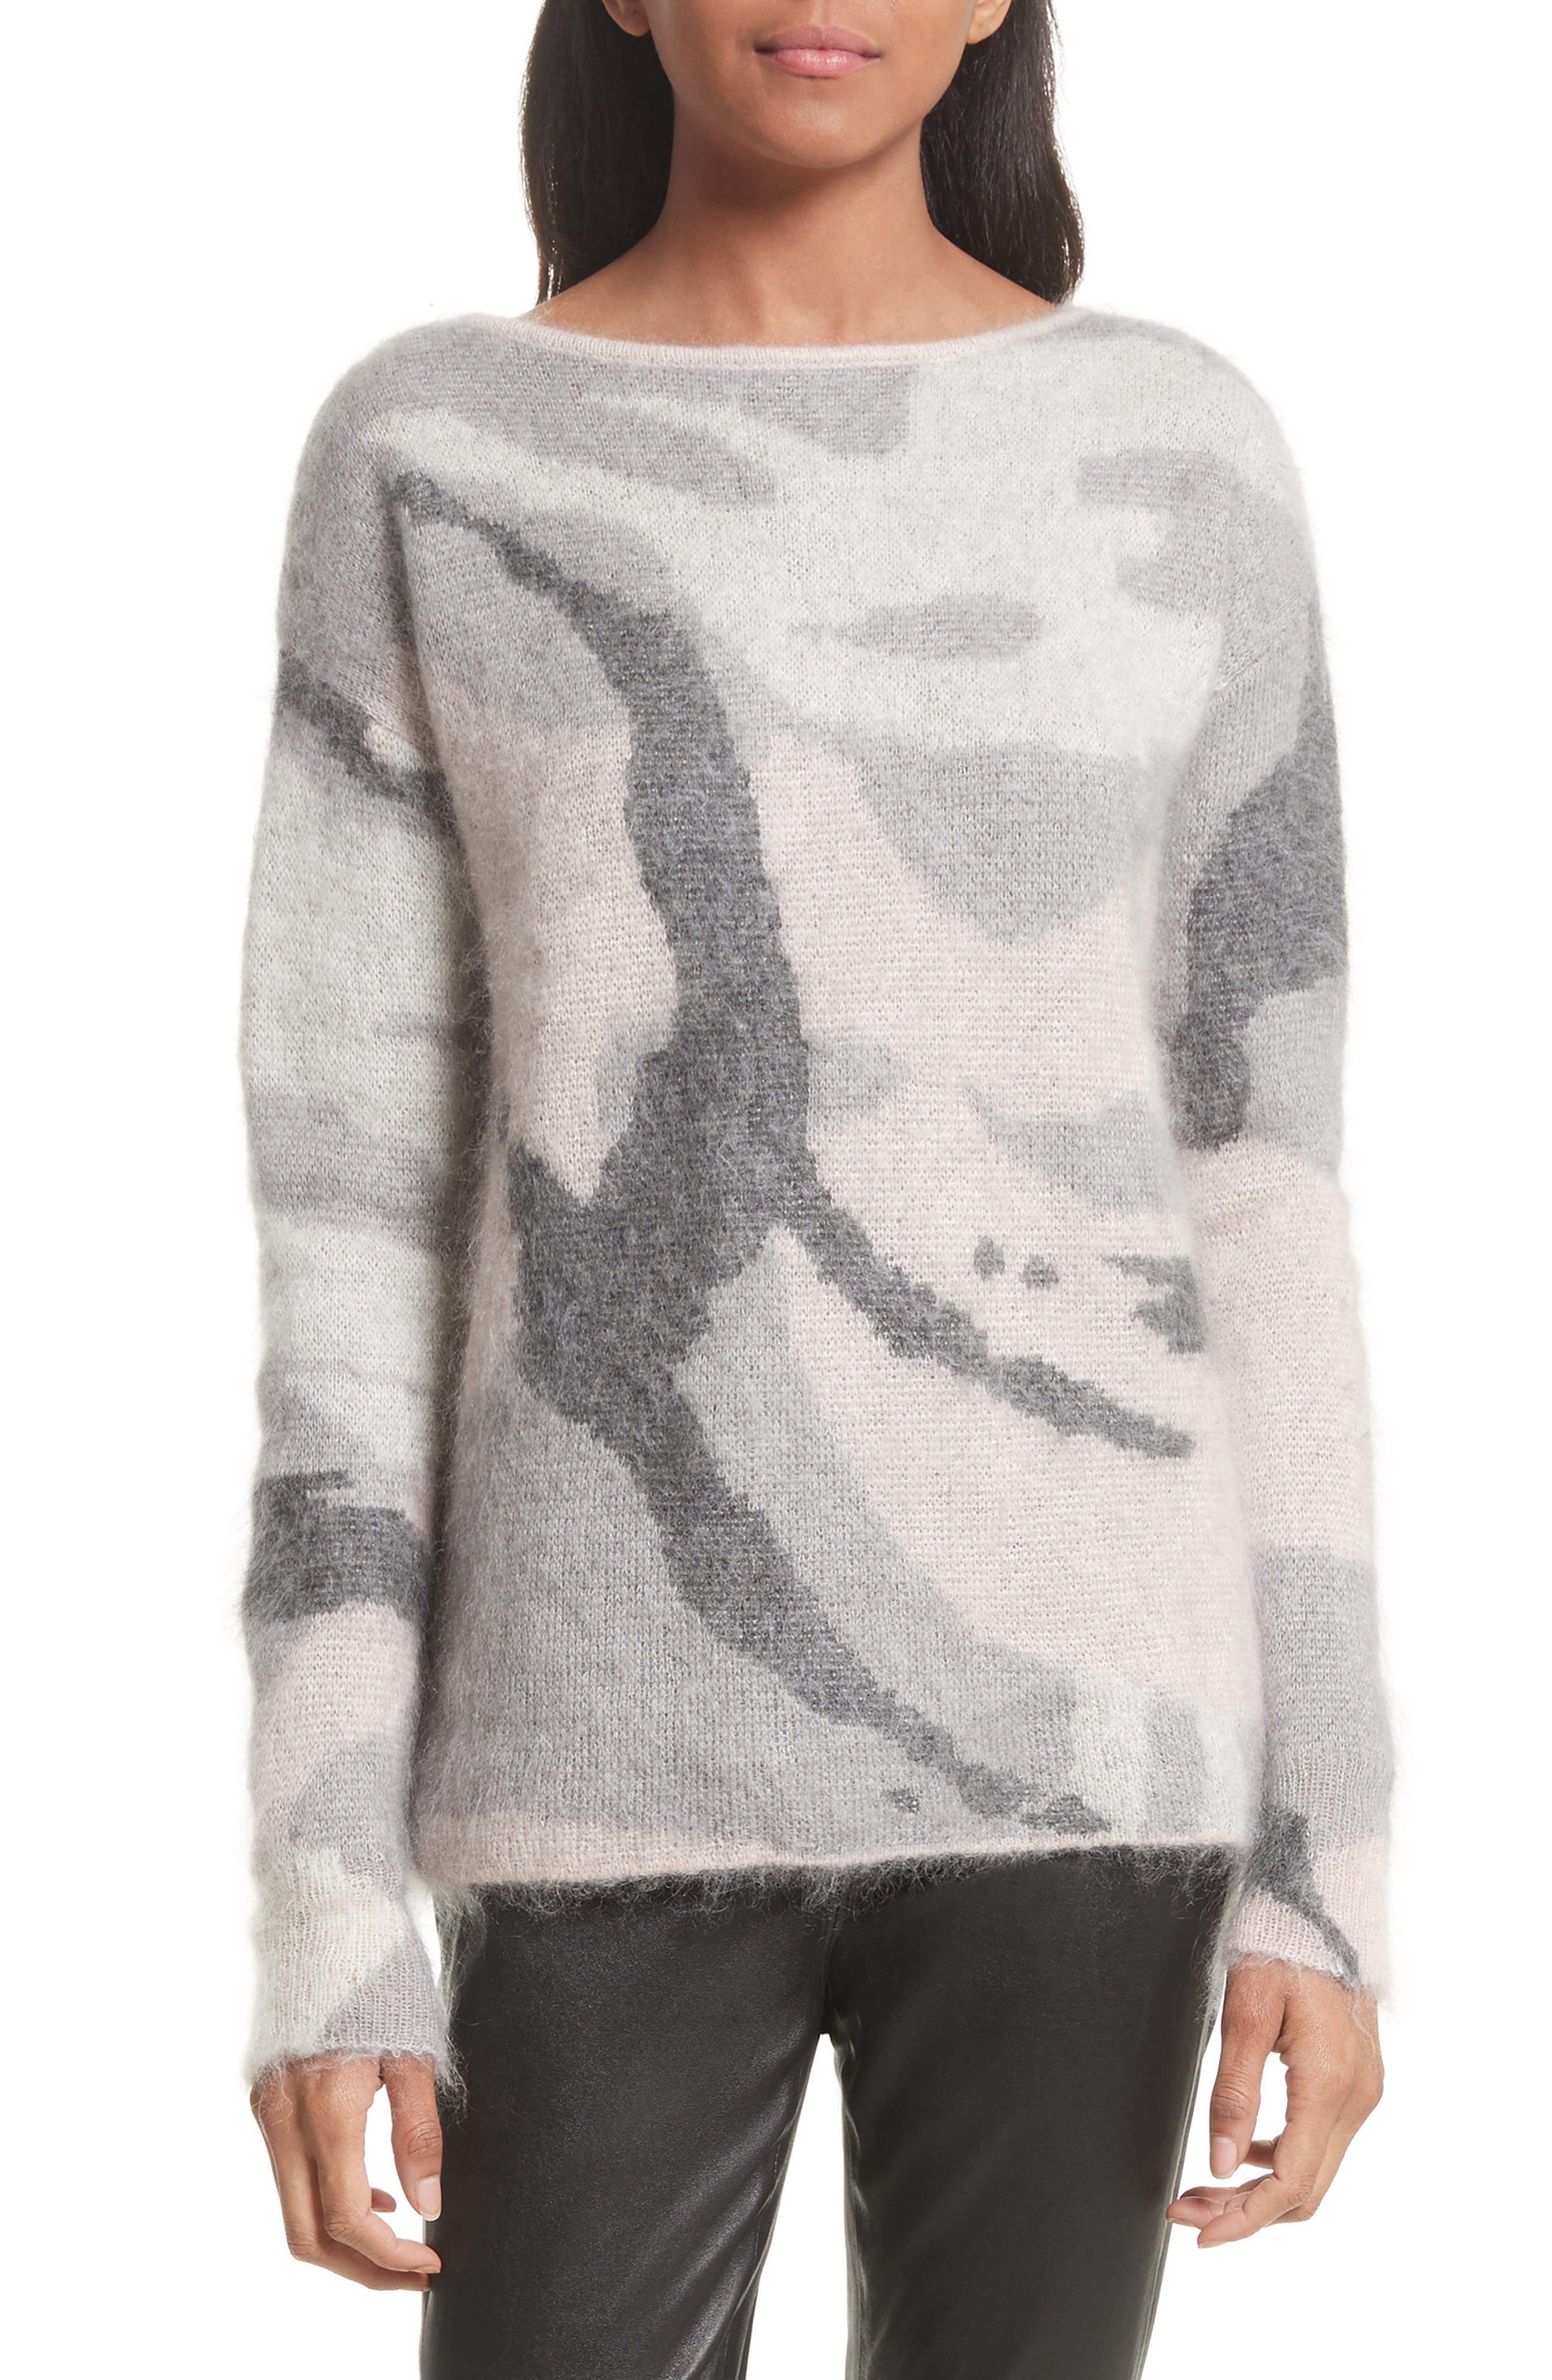 Alternate Image 1 Selected - rag & bone Sinclair Camouflage Jacquard Sweater